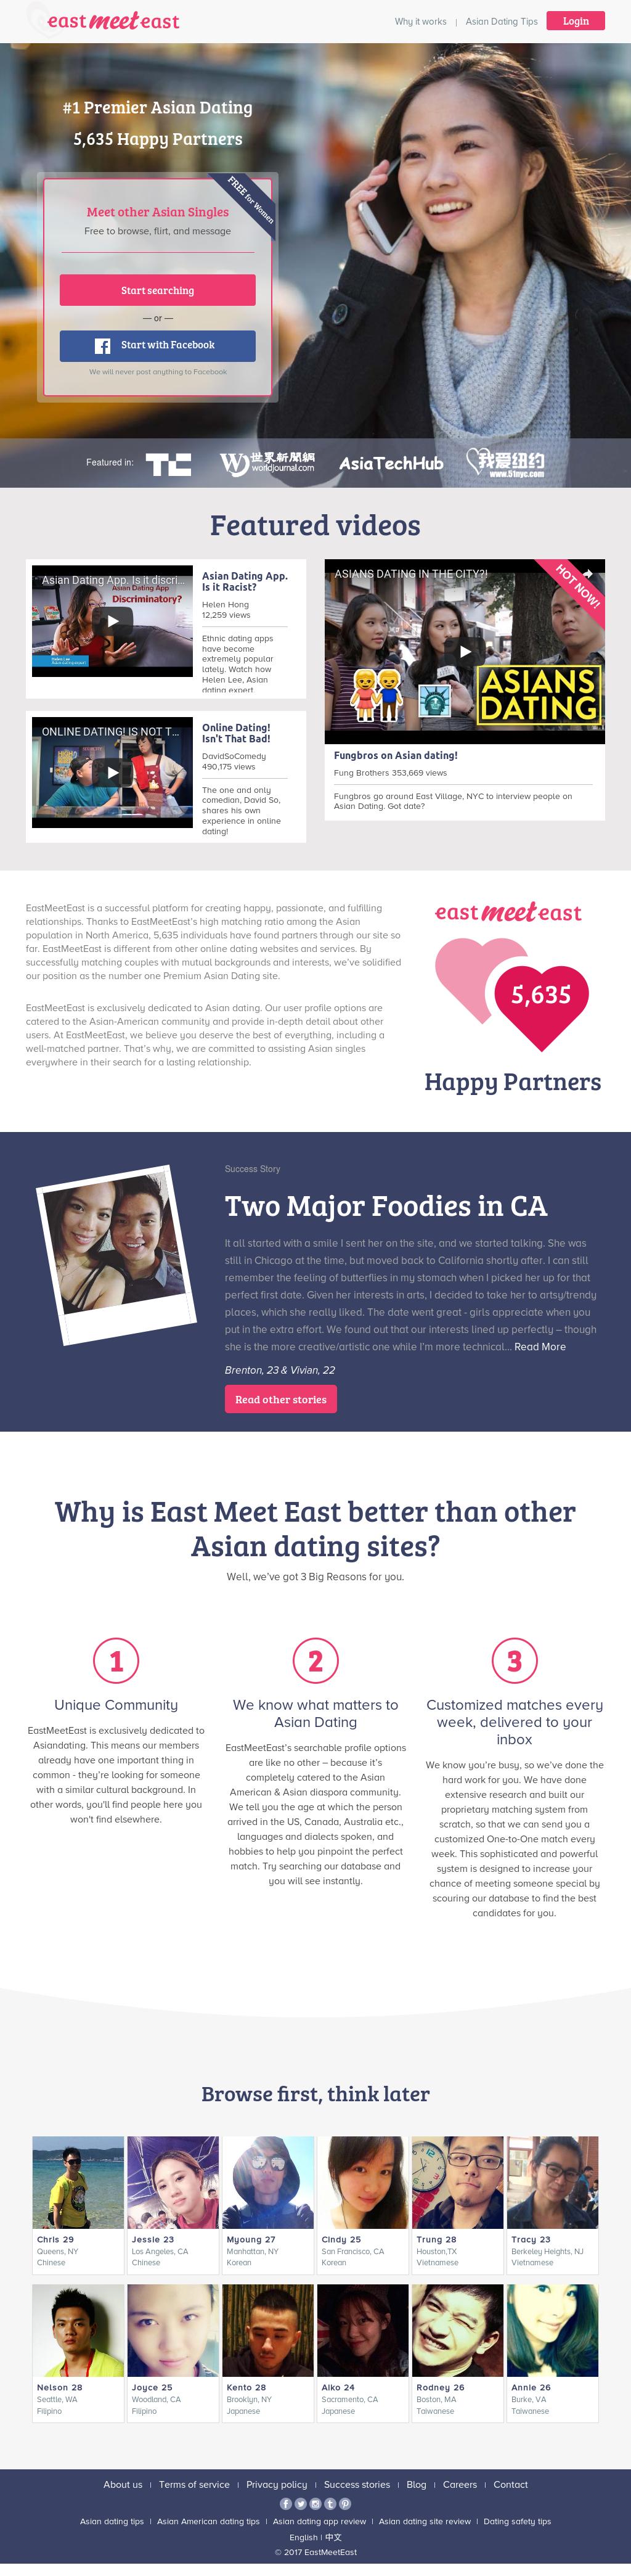 premie dating app Gratis svart online dating